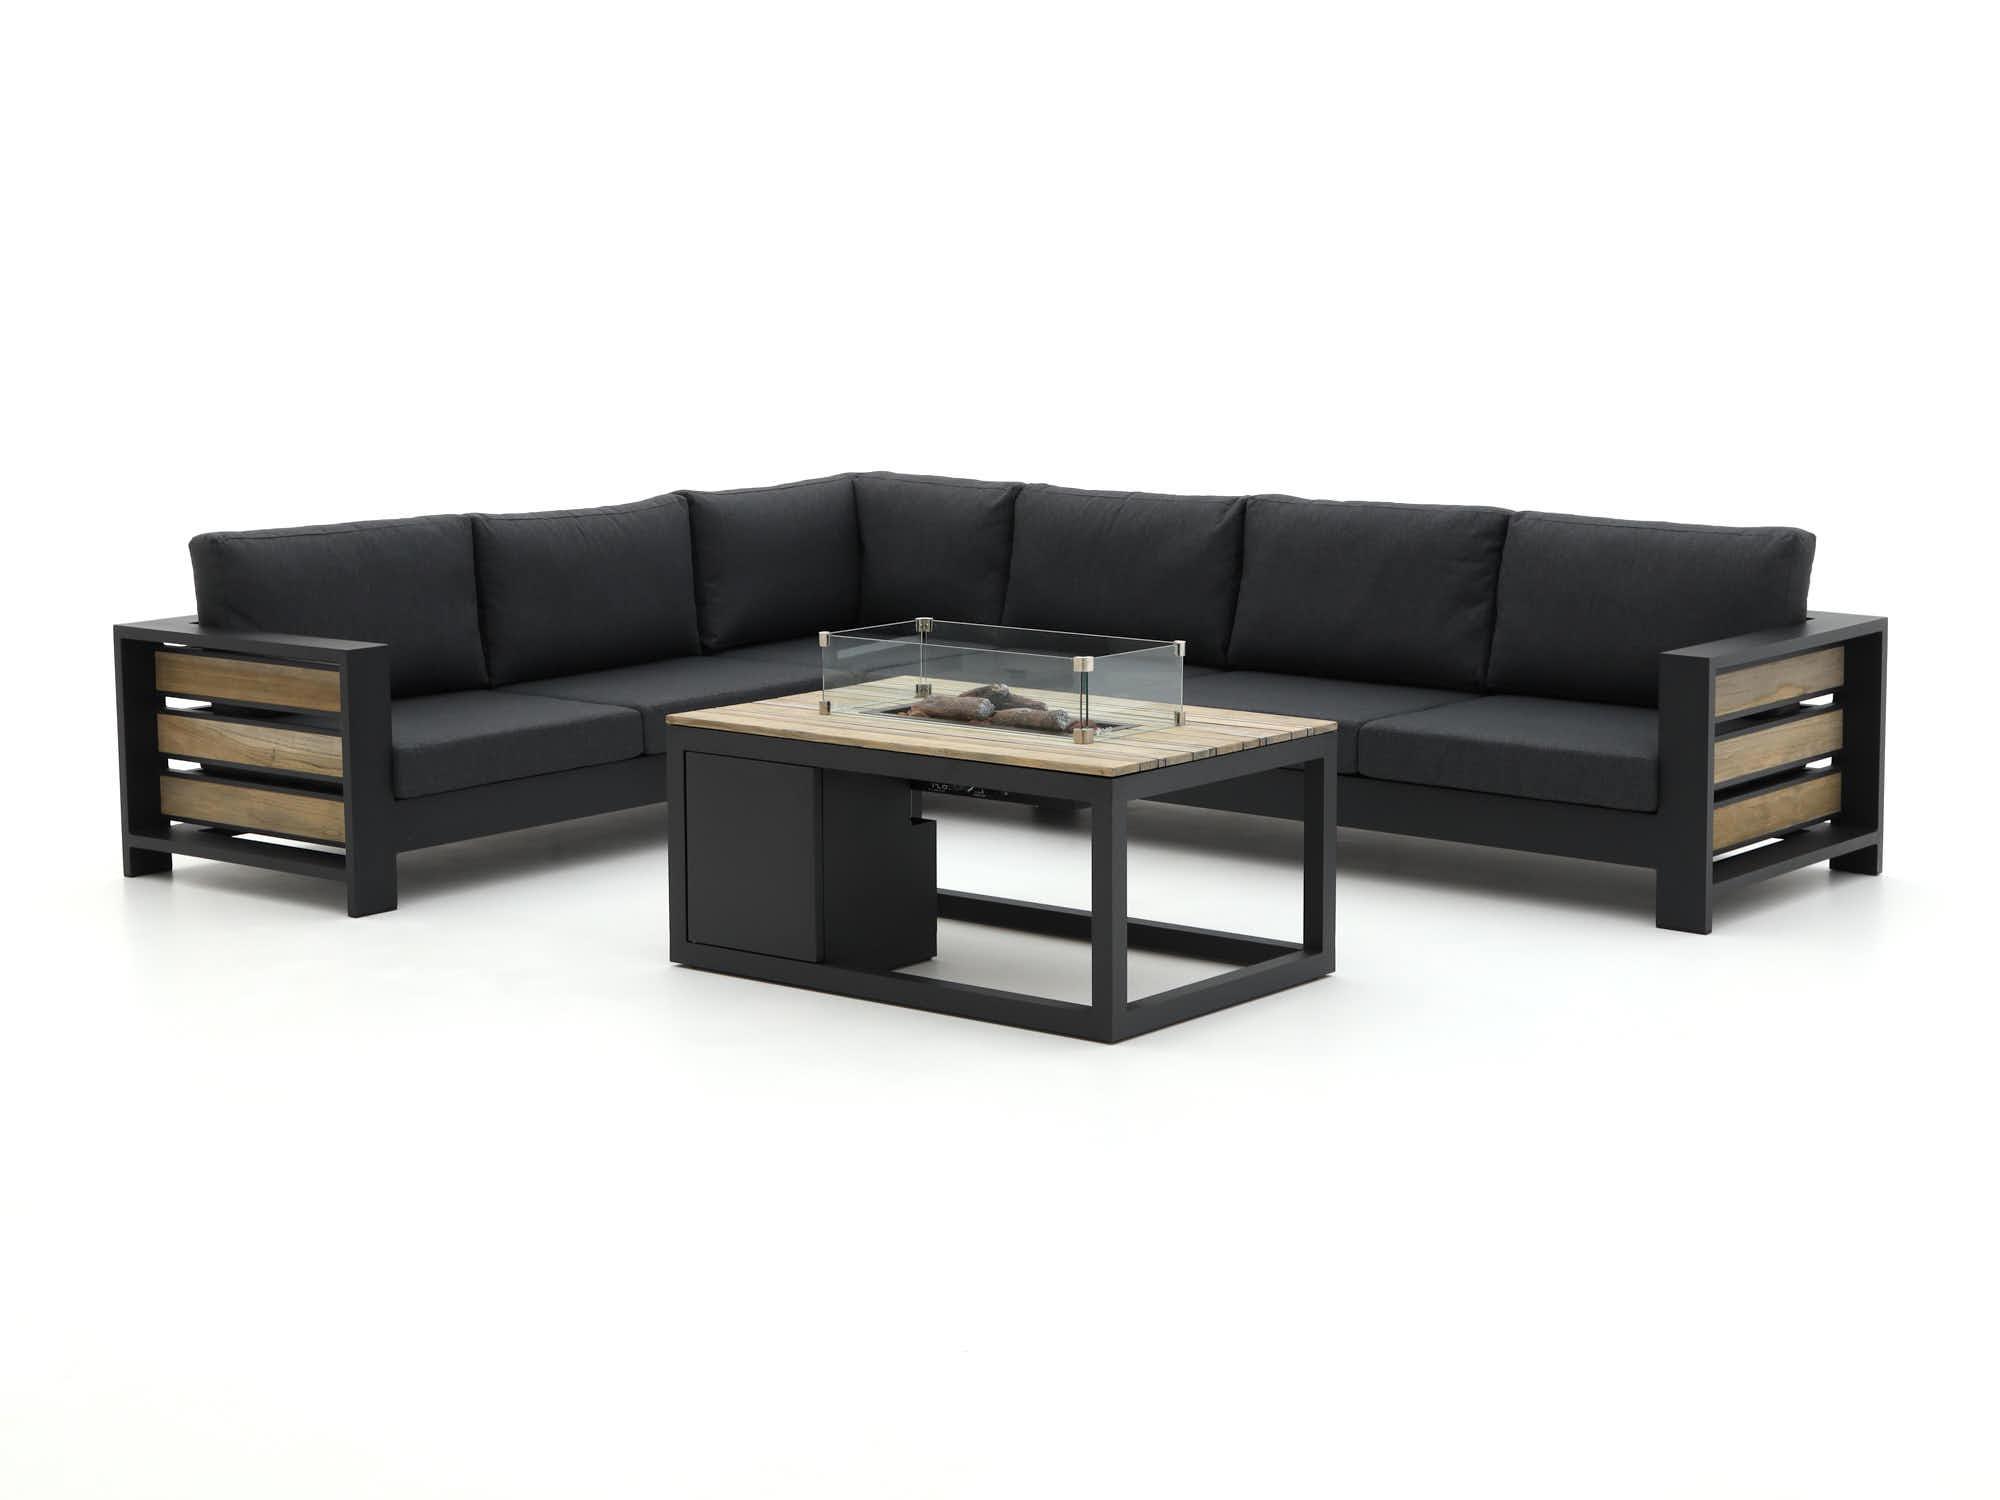 Bellagio Avolo/Cosiraw 120cm hoek loungeset 3-delig links - Laagste prijsgarantie!